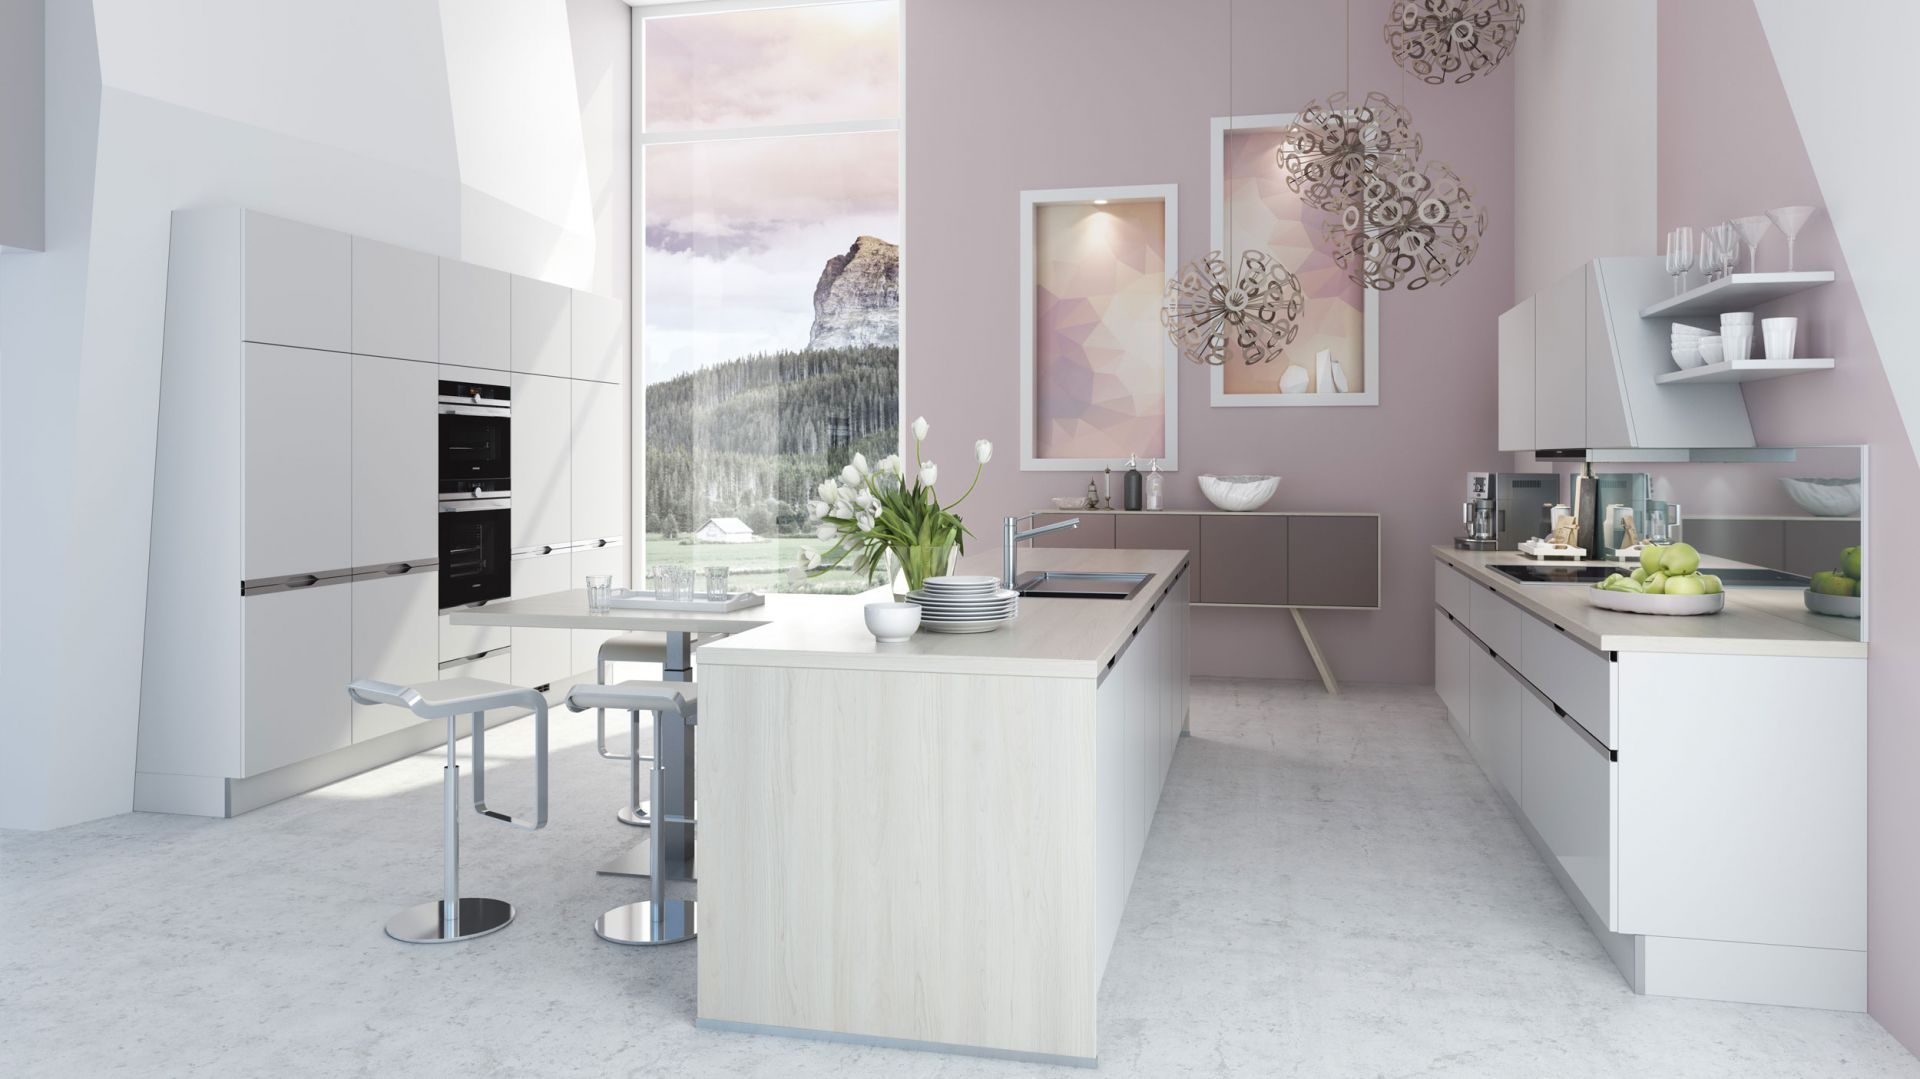 Kuchnia w pastelach. 3 piękne aranżacje. Fot. Brigitte Kuchen